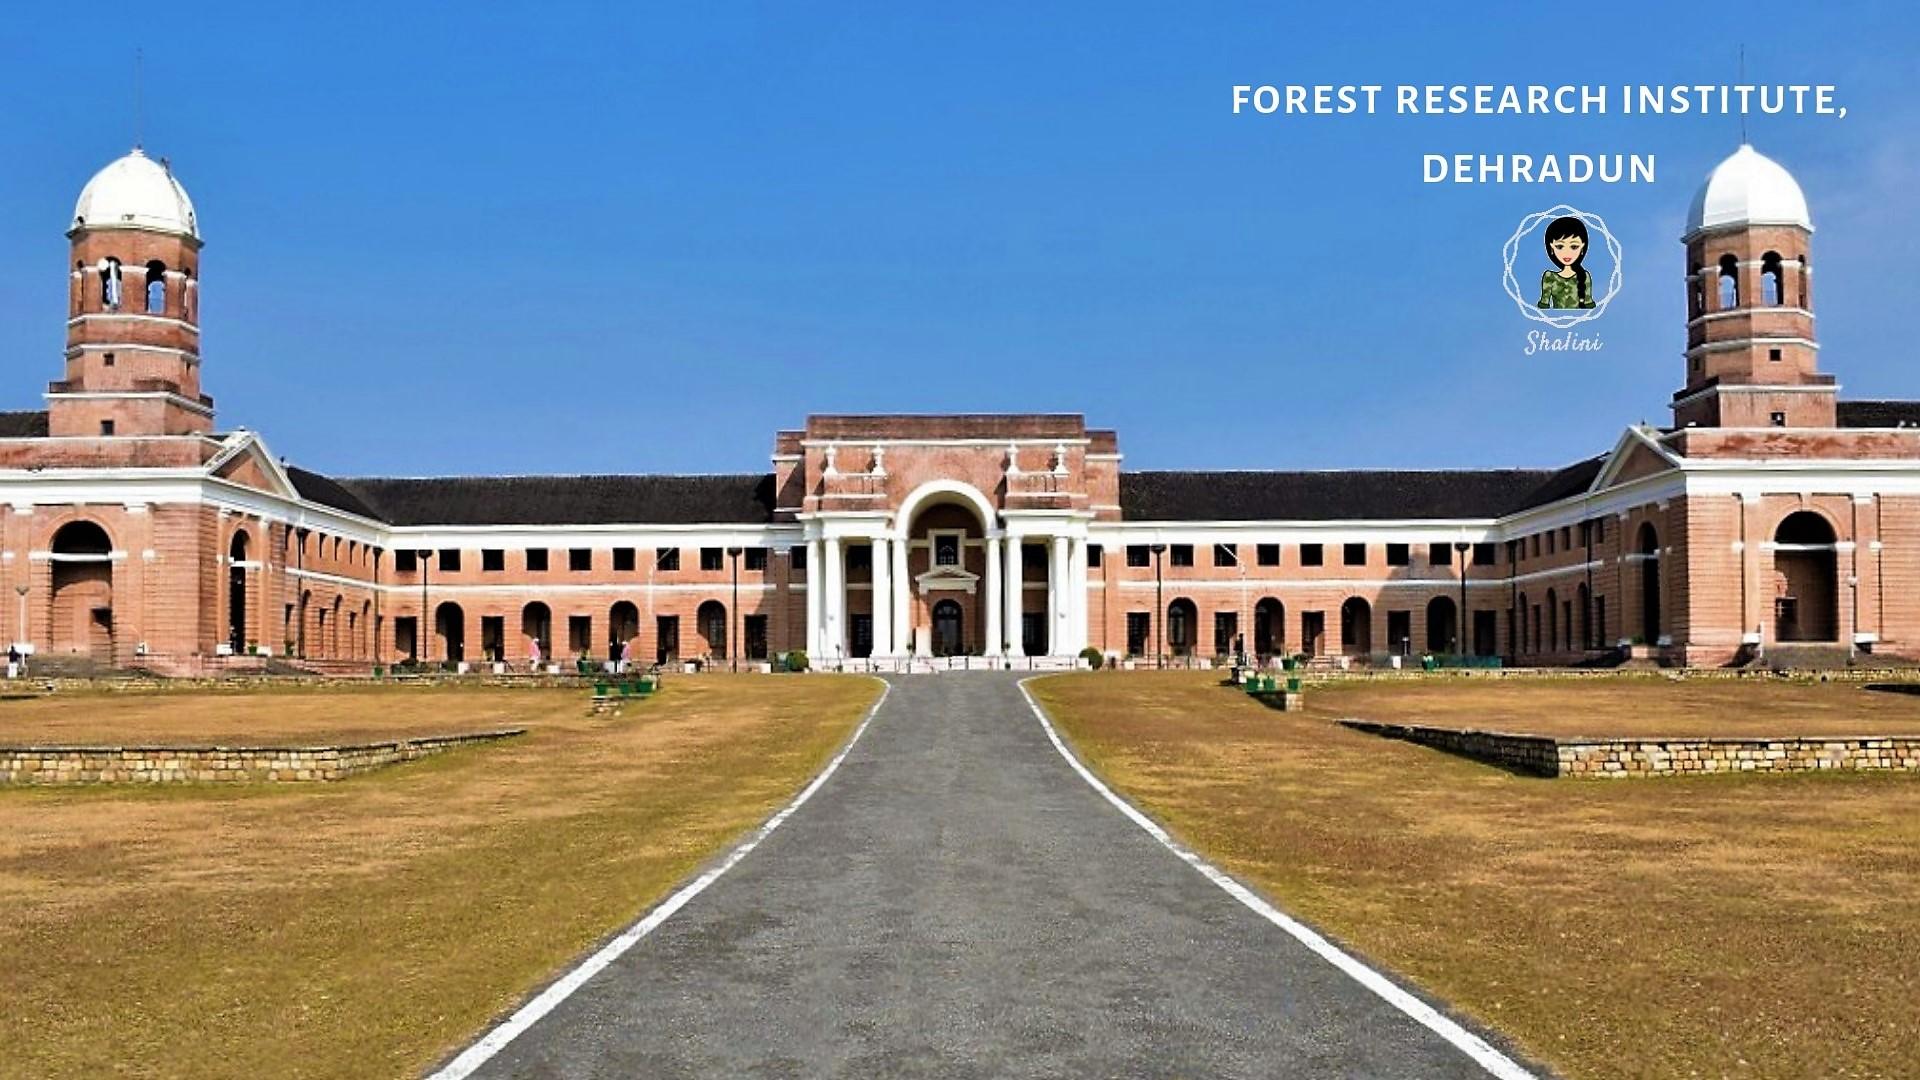 FRI Forest Research Institute Dehradun kohleyedme.com